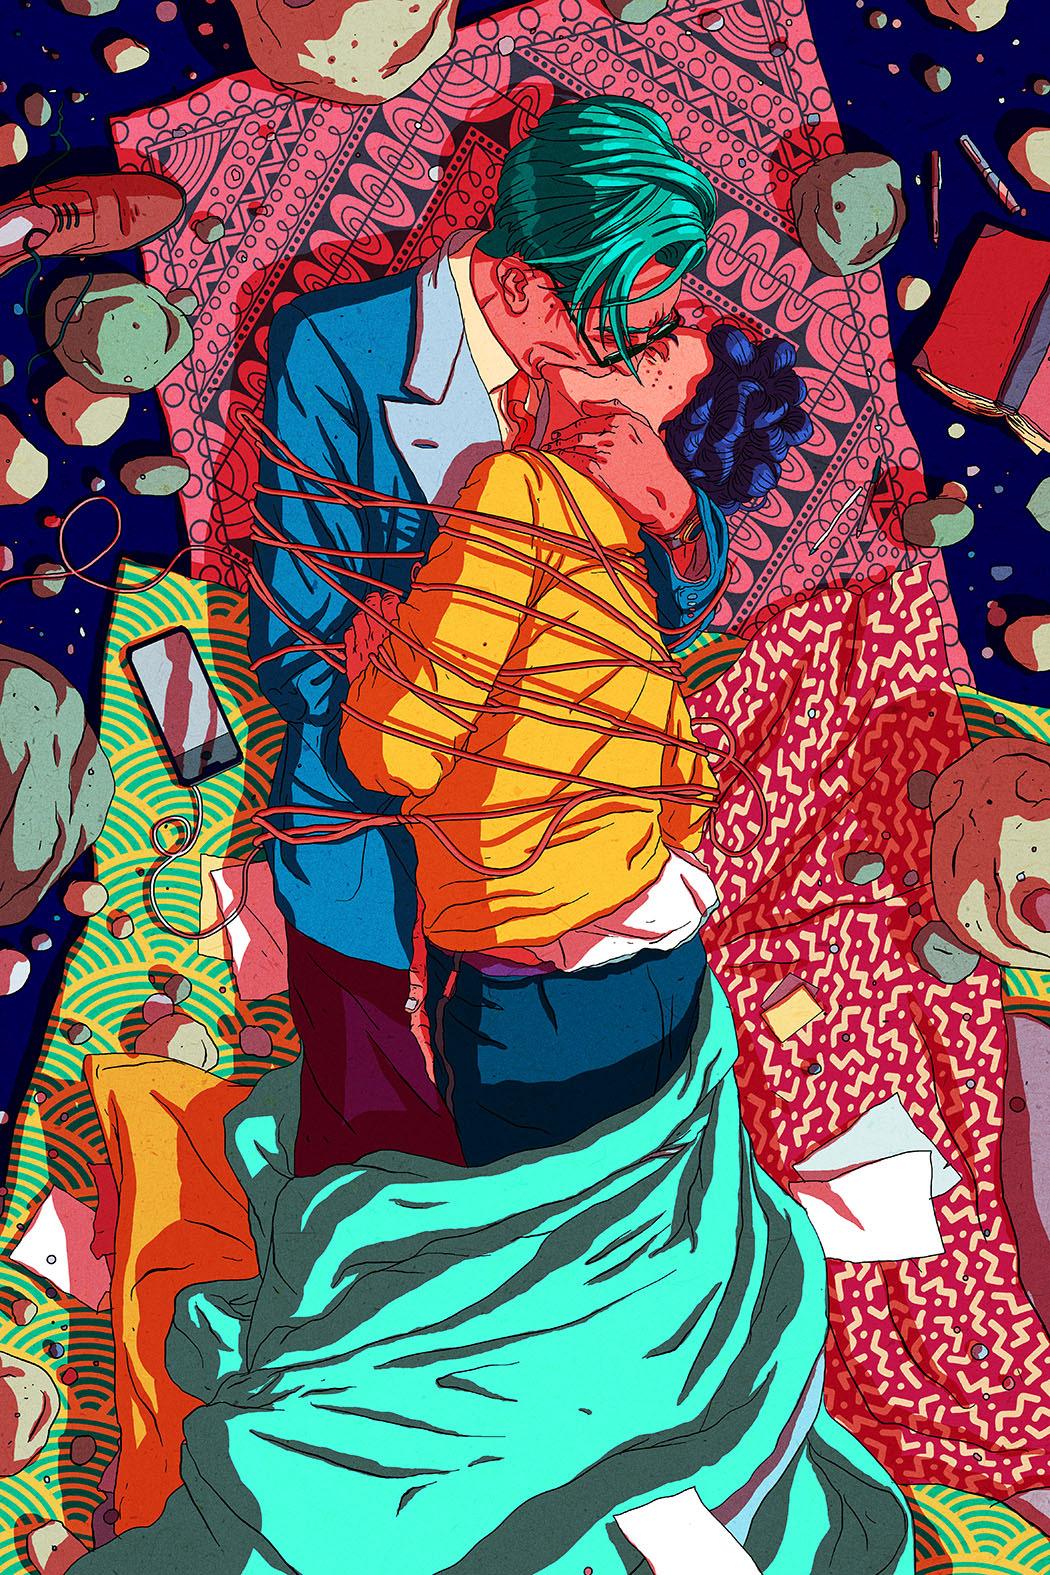 acid,colors,surreal,strange,mood,pop,symbolism,narrative,weird,trip